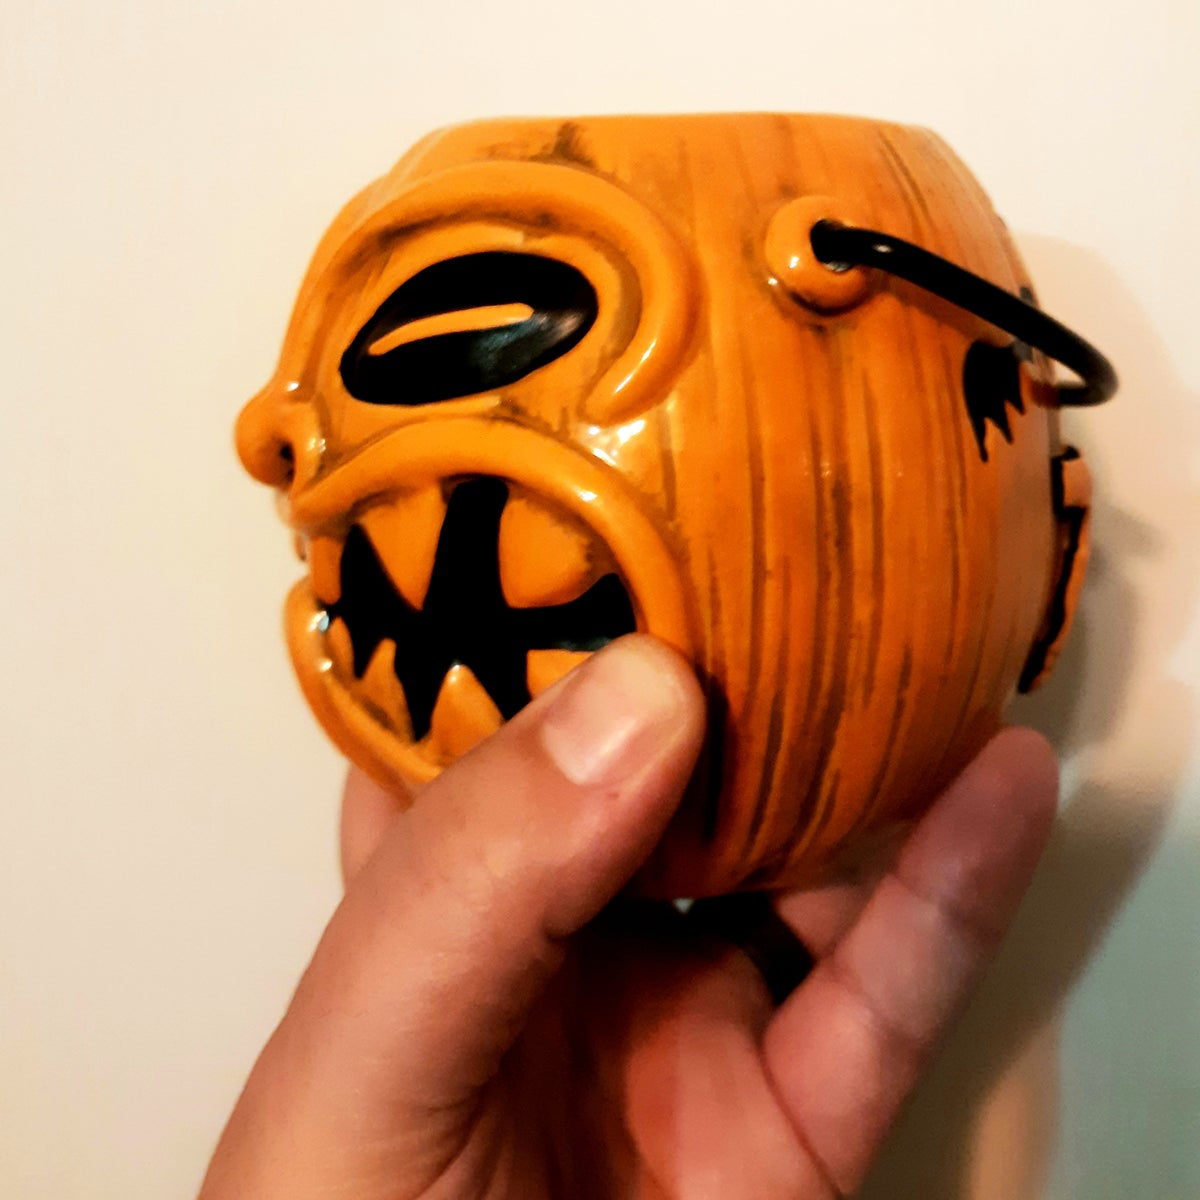 TRICK OR TIKI Limited Edition Halloween Pumpkin Pail 16oz Tiki Mug w/ Movable Handle